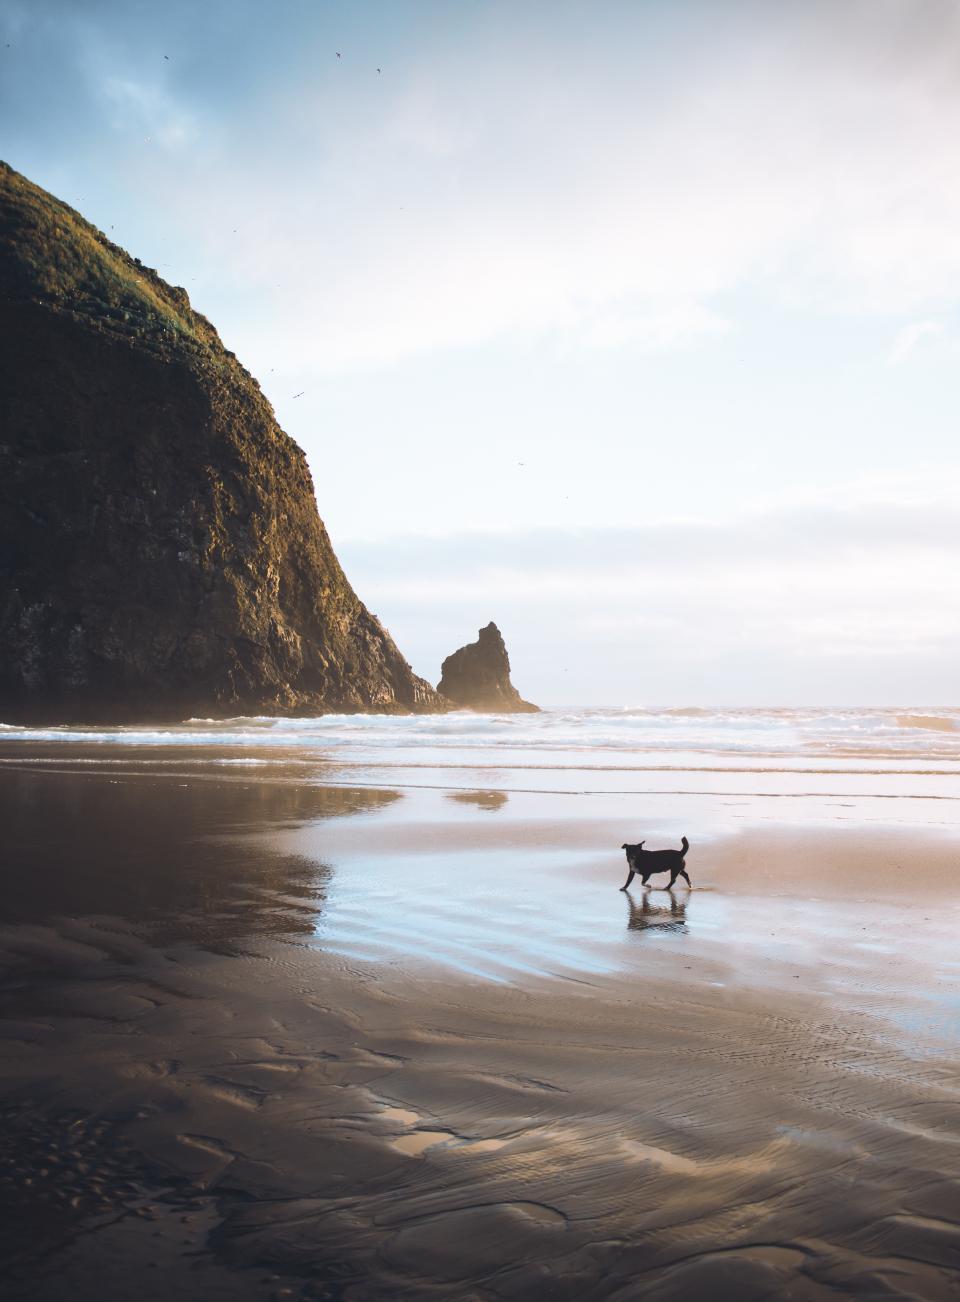 sea, ocean, water, waves, nature, beach, shore, coast, hill, mountain, sky, clouds, dog, pet, animal